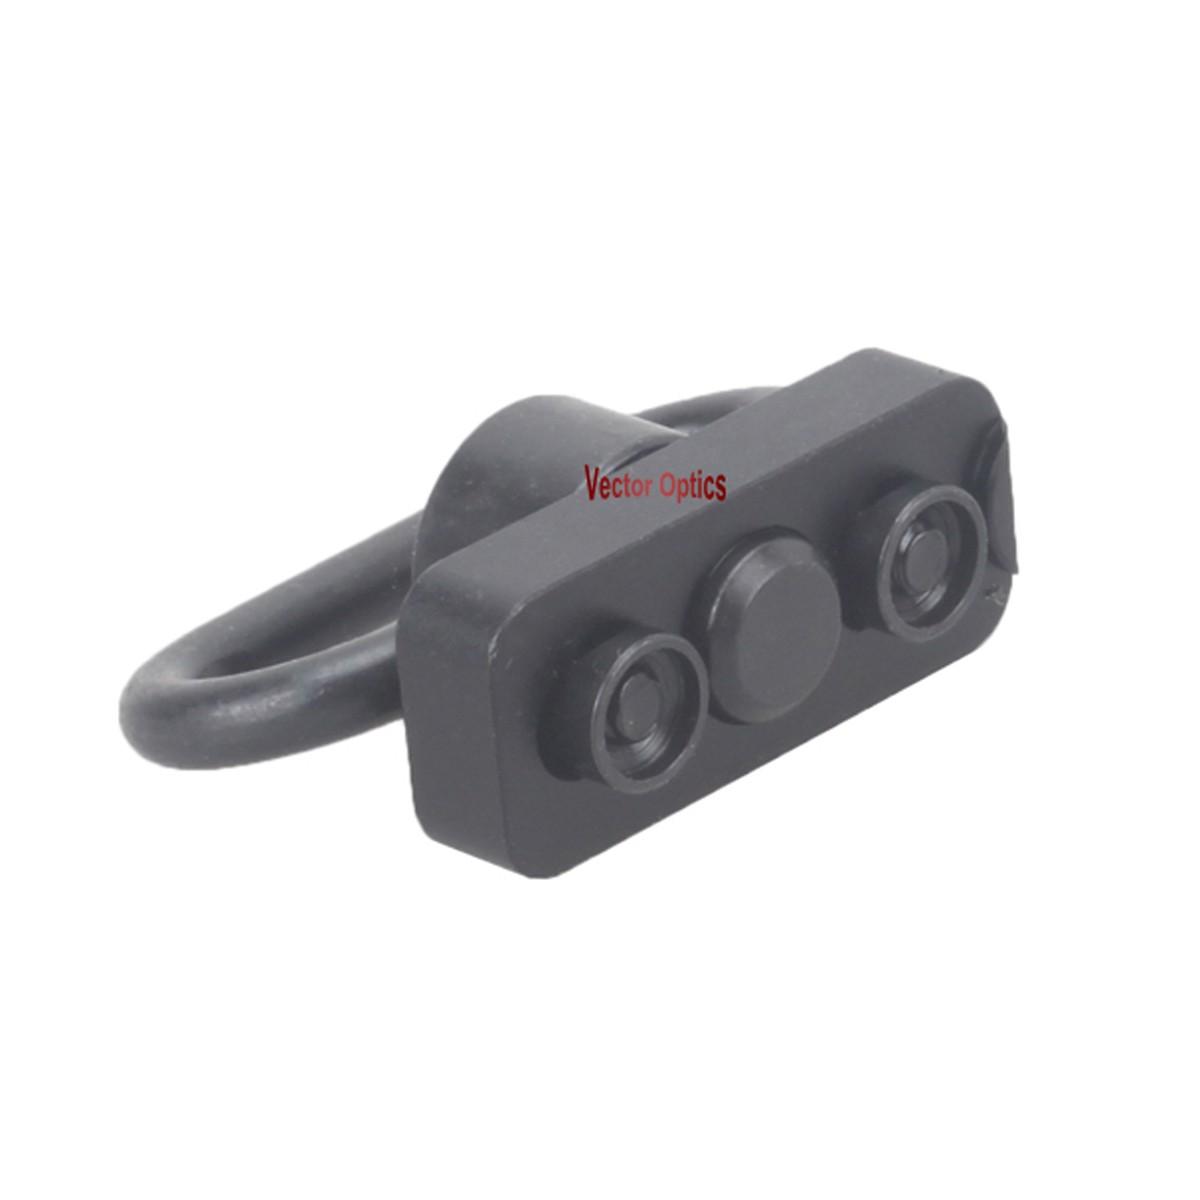 Sling Swivel Loop Push Button